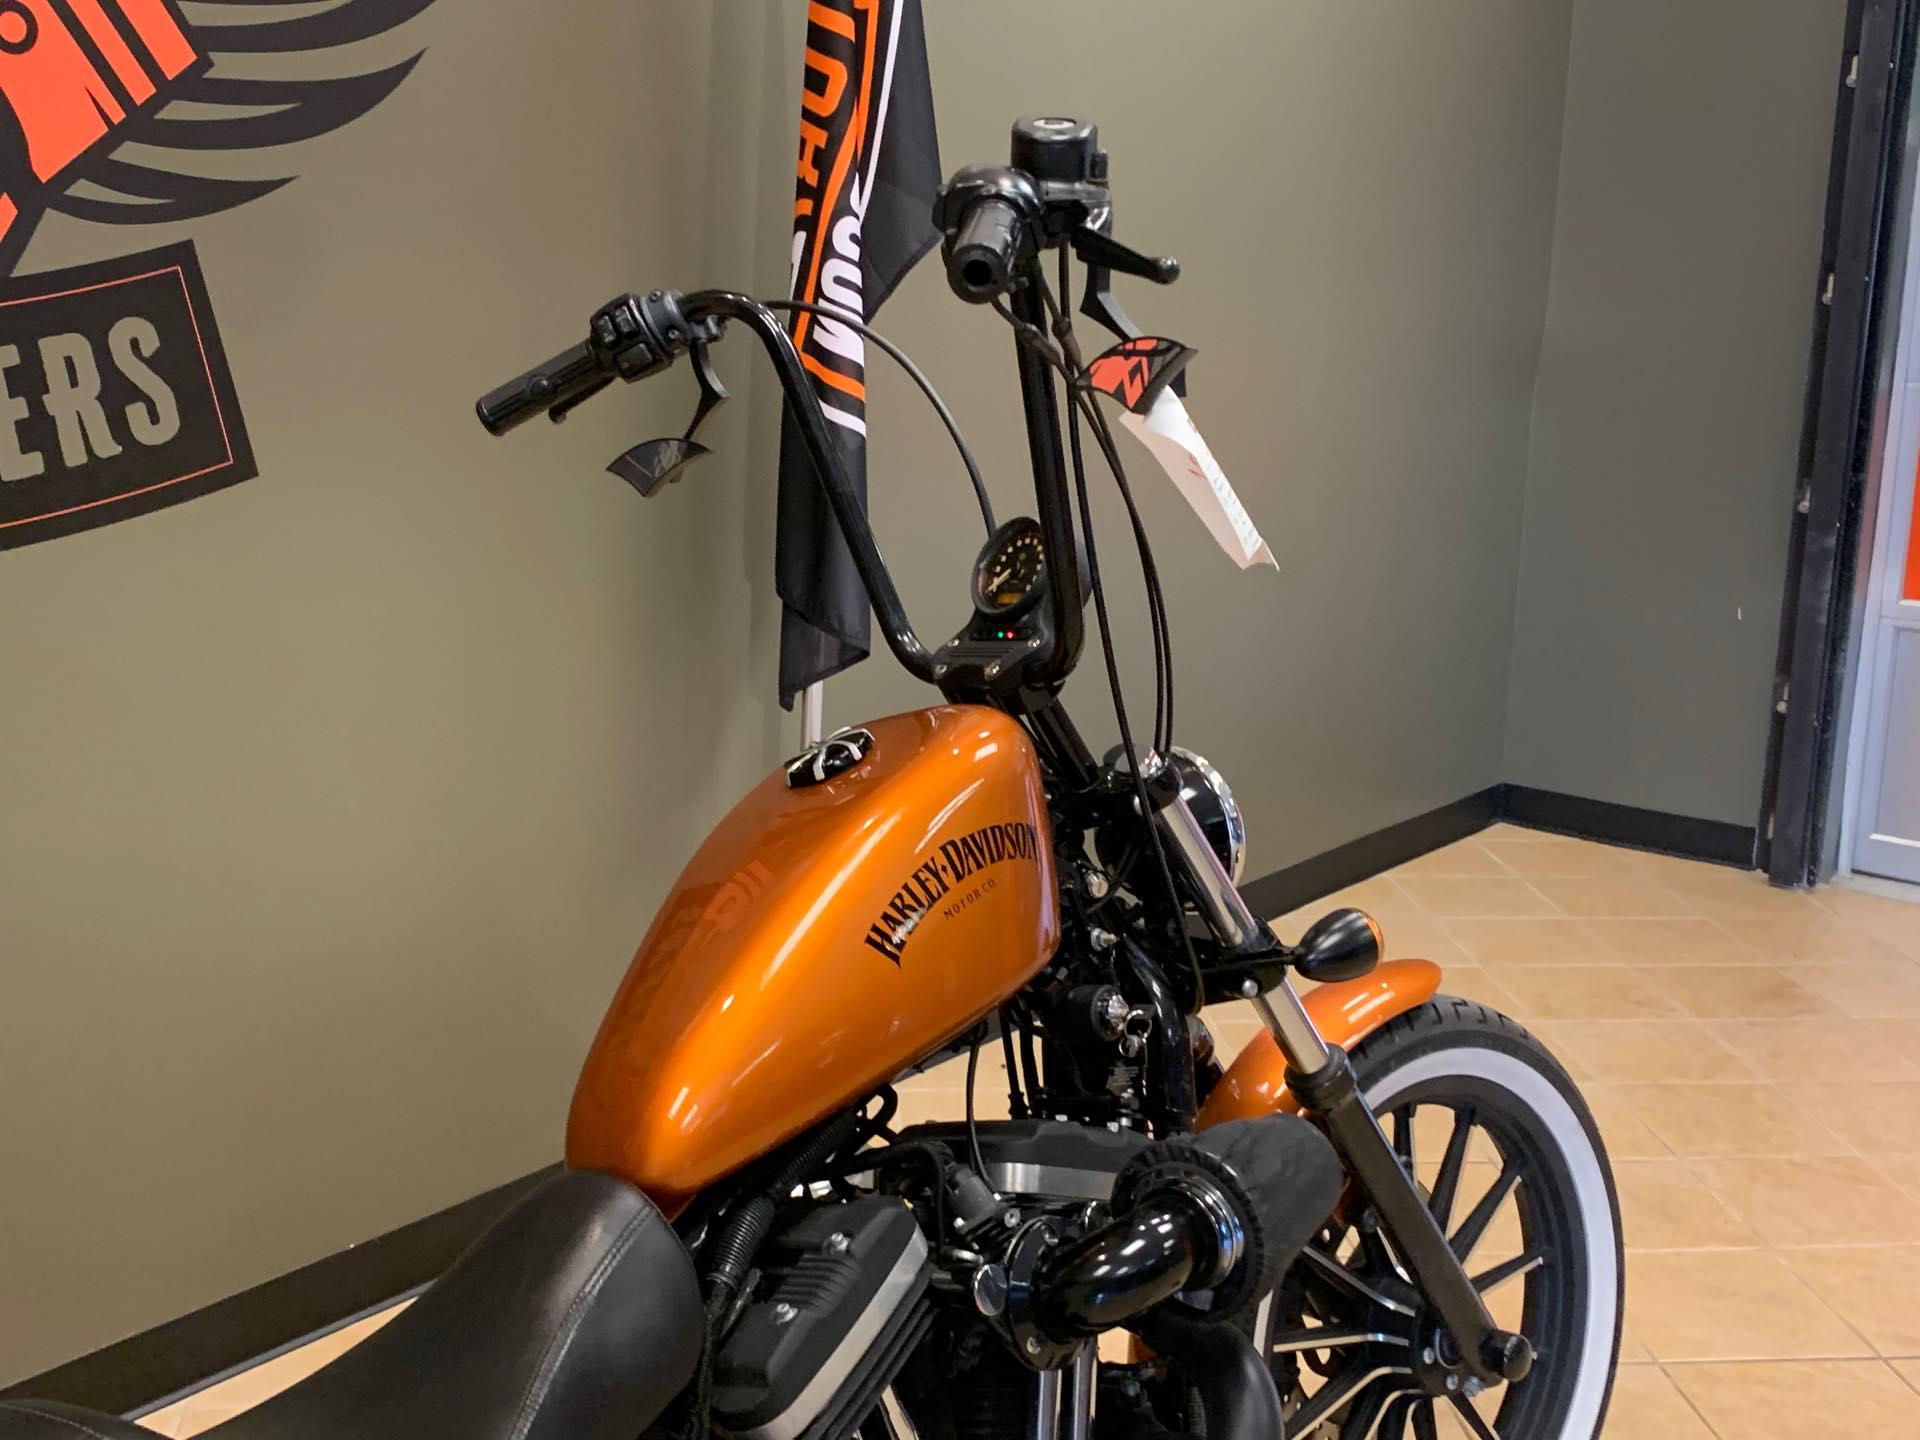 2014 Harley-Davidson Sportster Iron 883 at Loess Hills Harley-Davidson